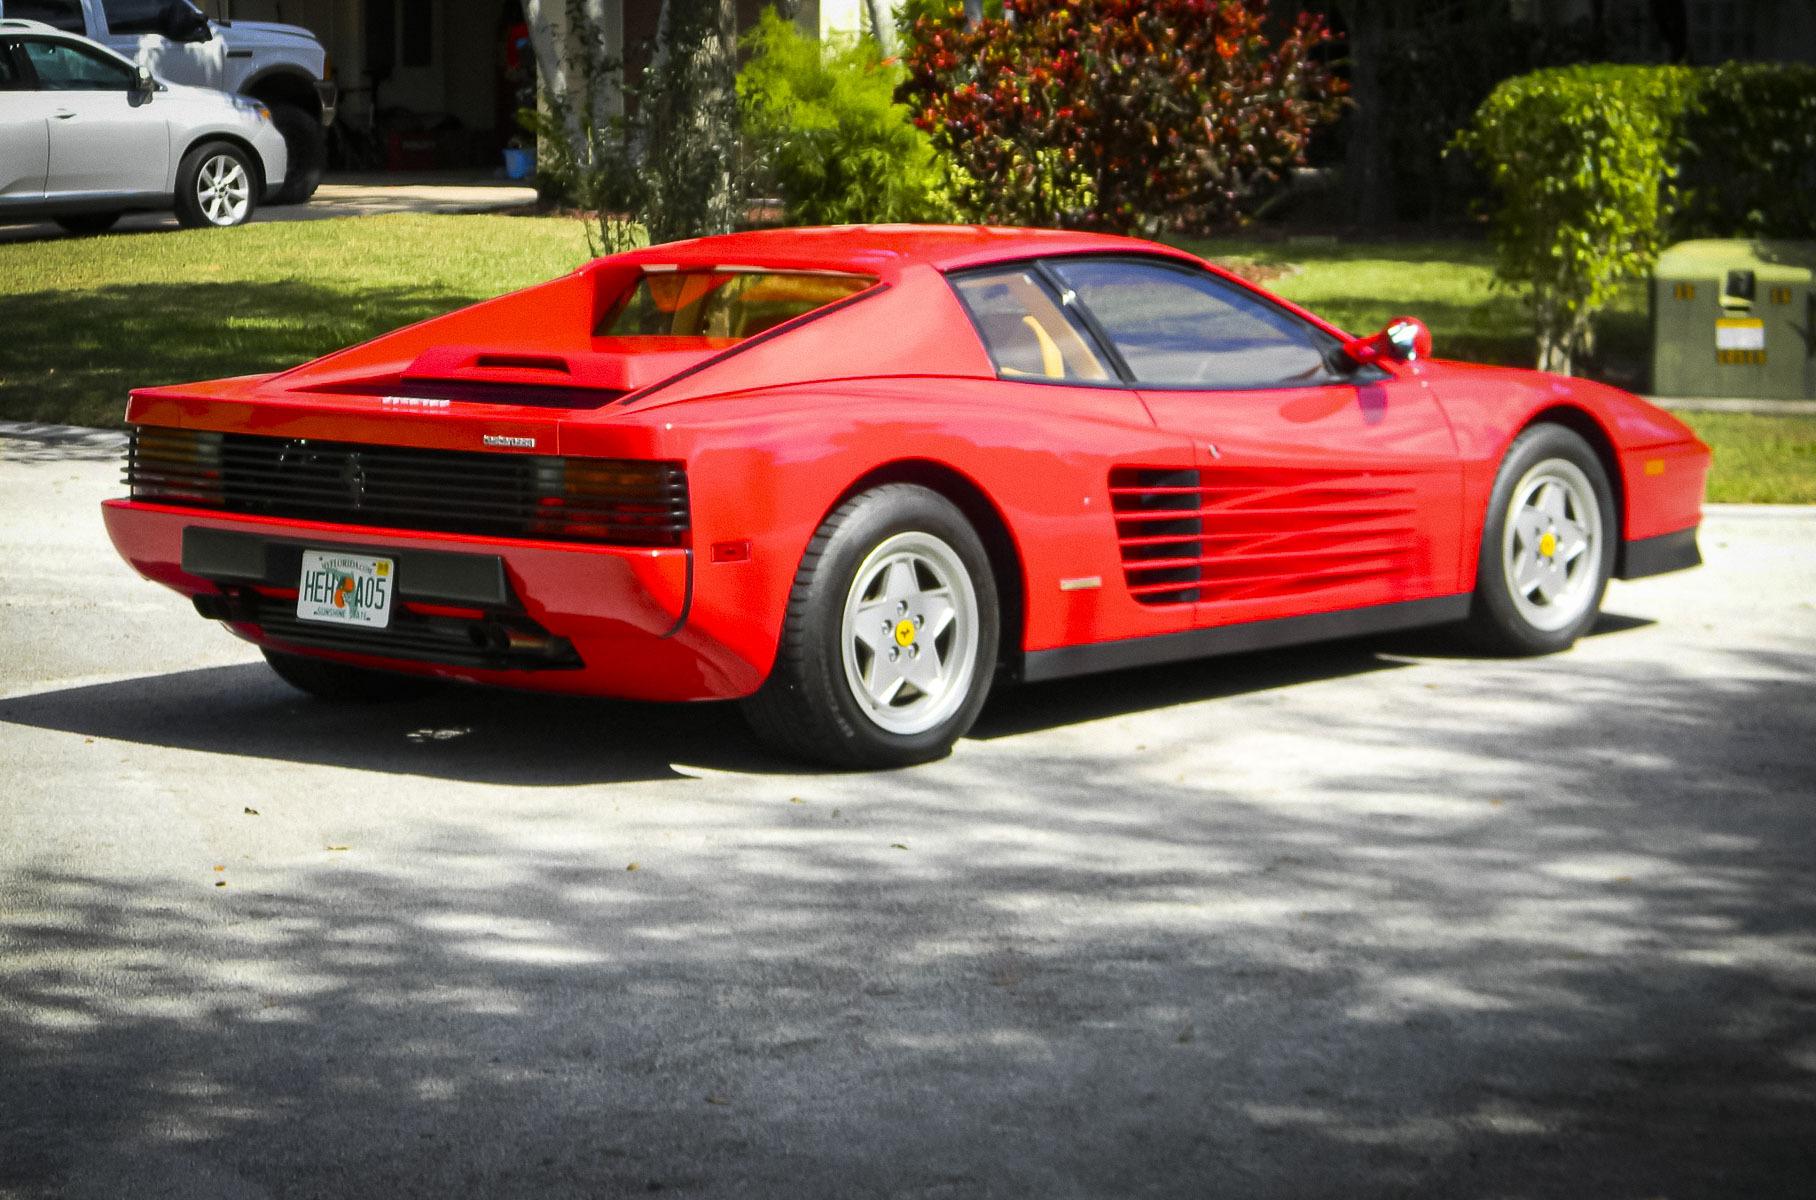 Обнаружен легендарный 30-летний суперкар Ferrari почти без пробега